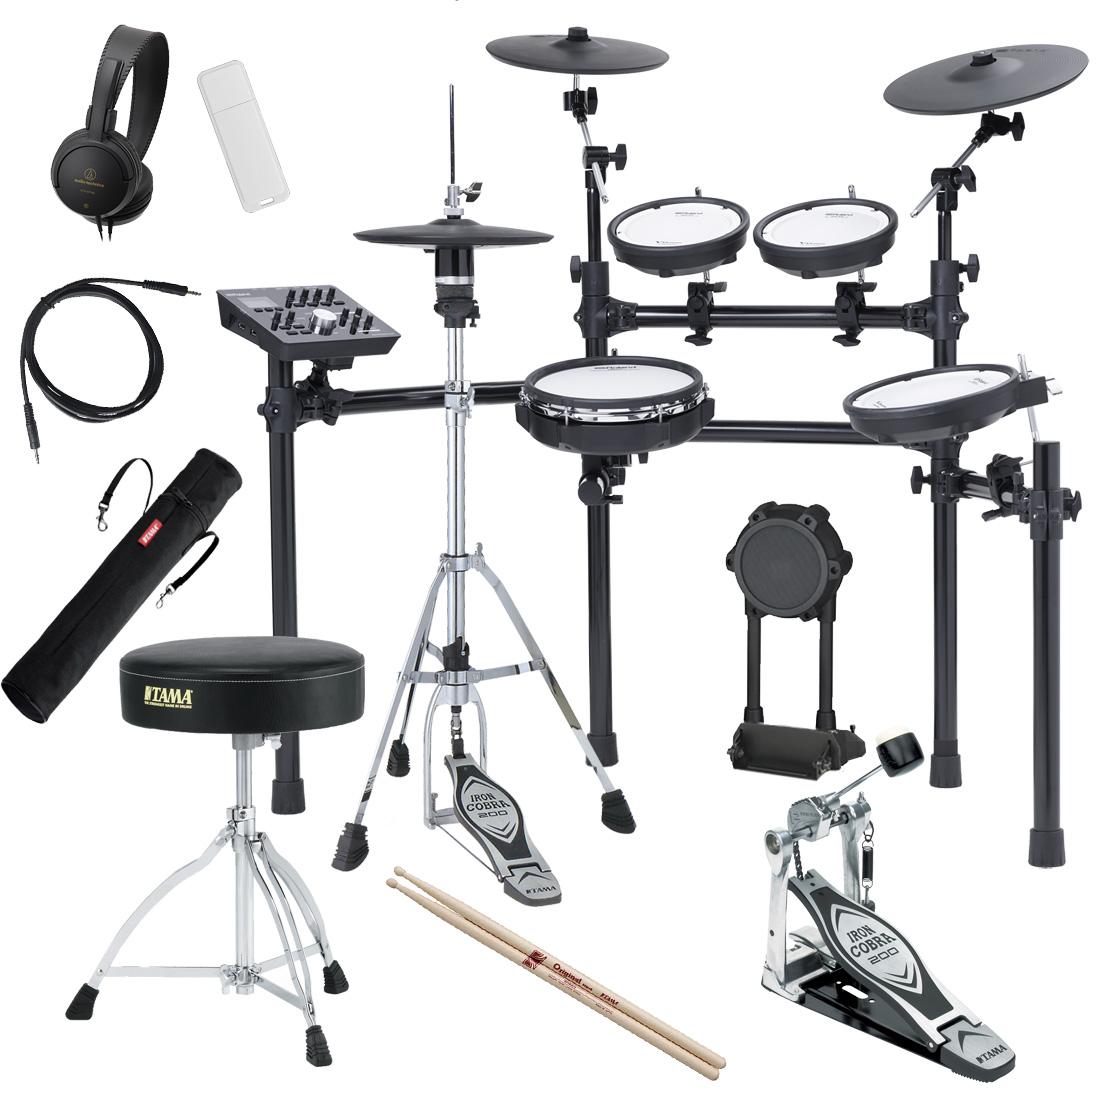 【Rolandキャッシュバック10000円対象】Roland Drum System TD-25K-S TAMAスターターパック 電子ドラムセット【YRK】